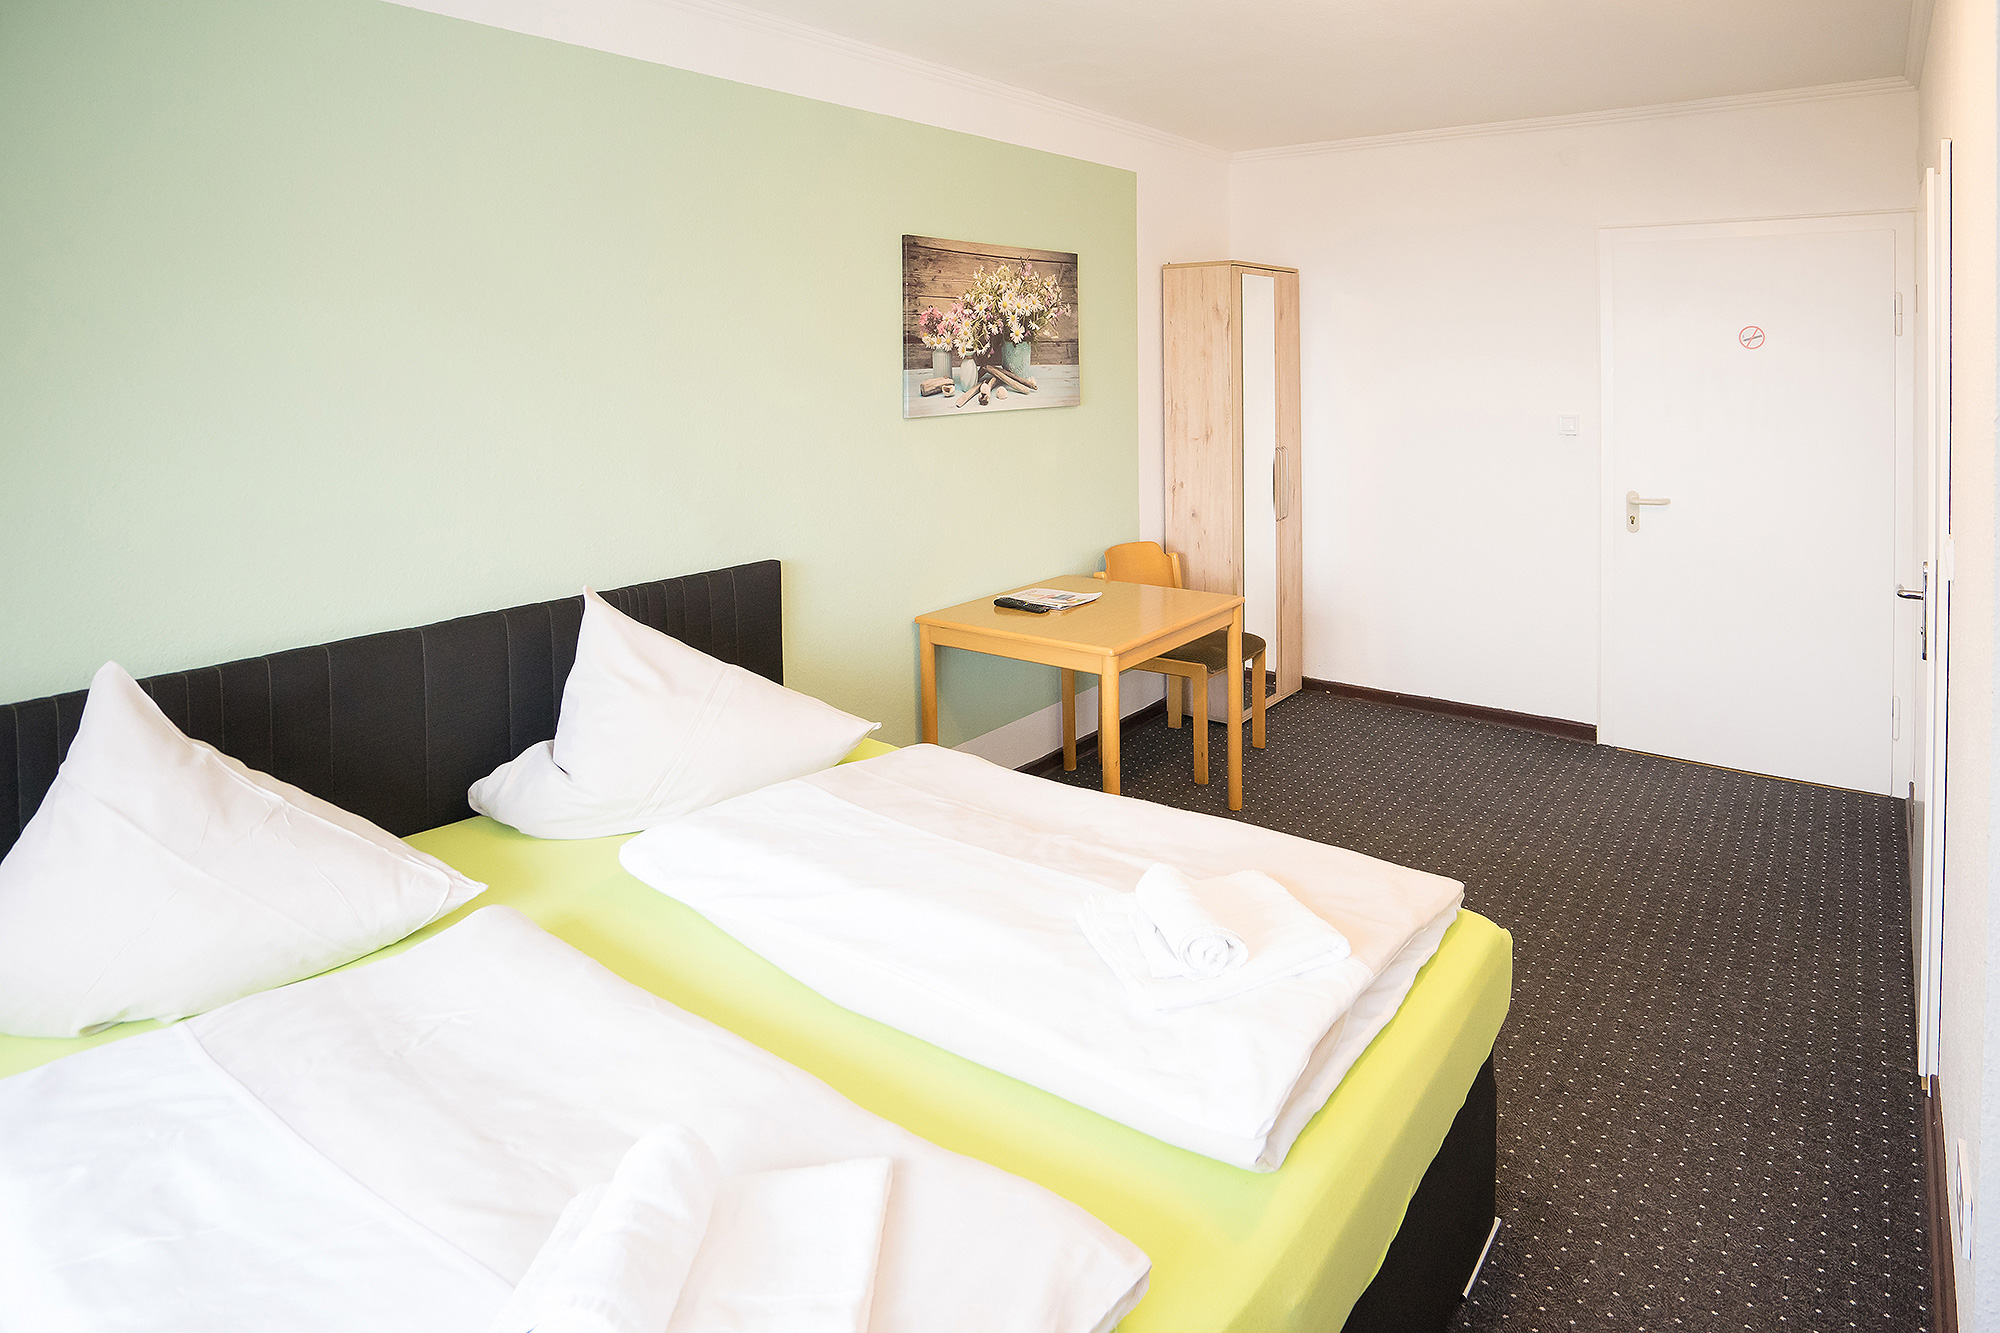 Doppelbett Hotel Zimmer buchen Berghotel